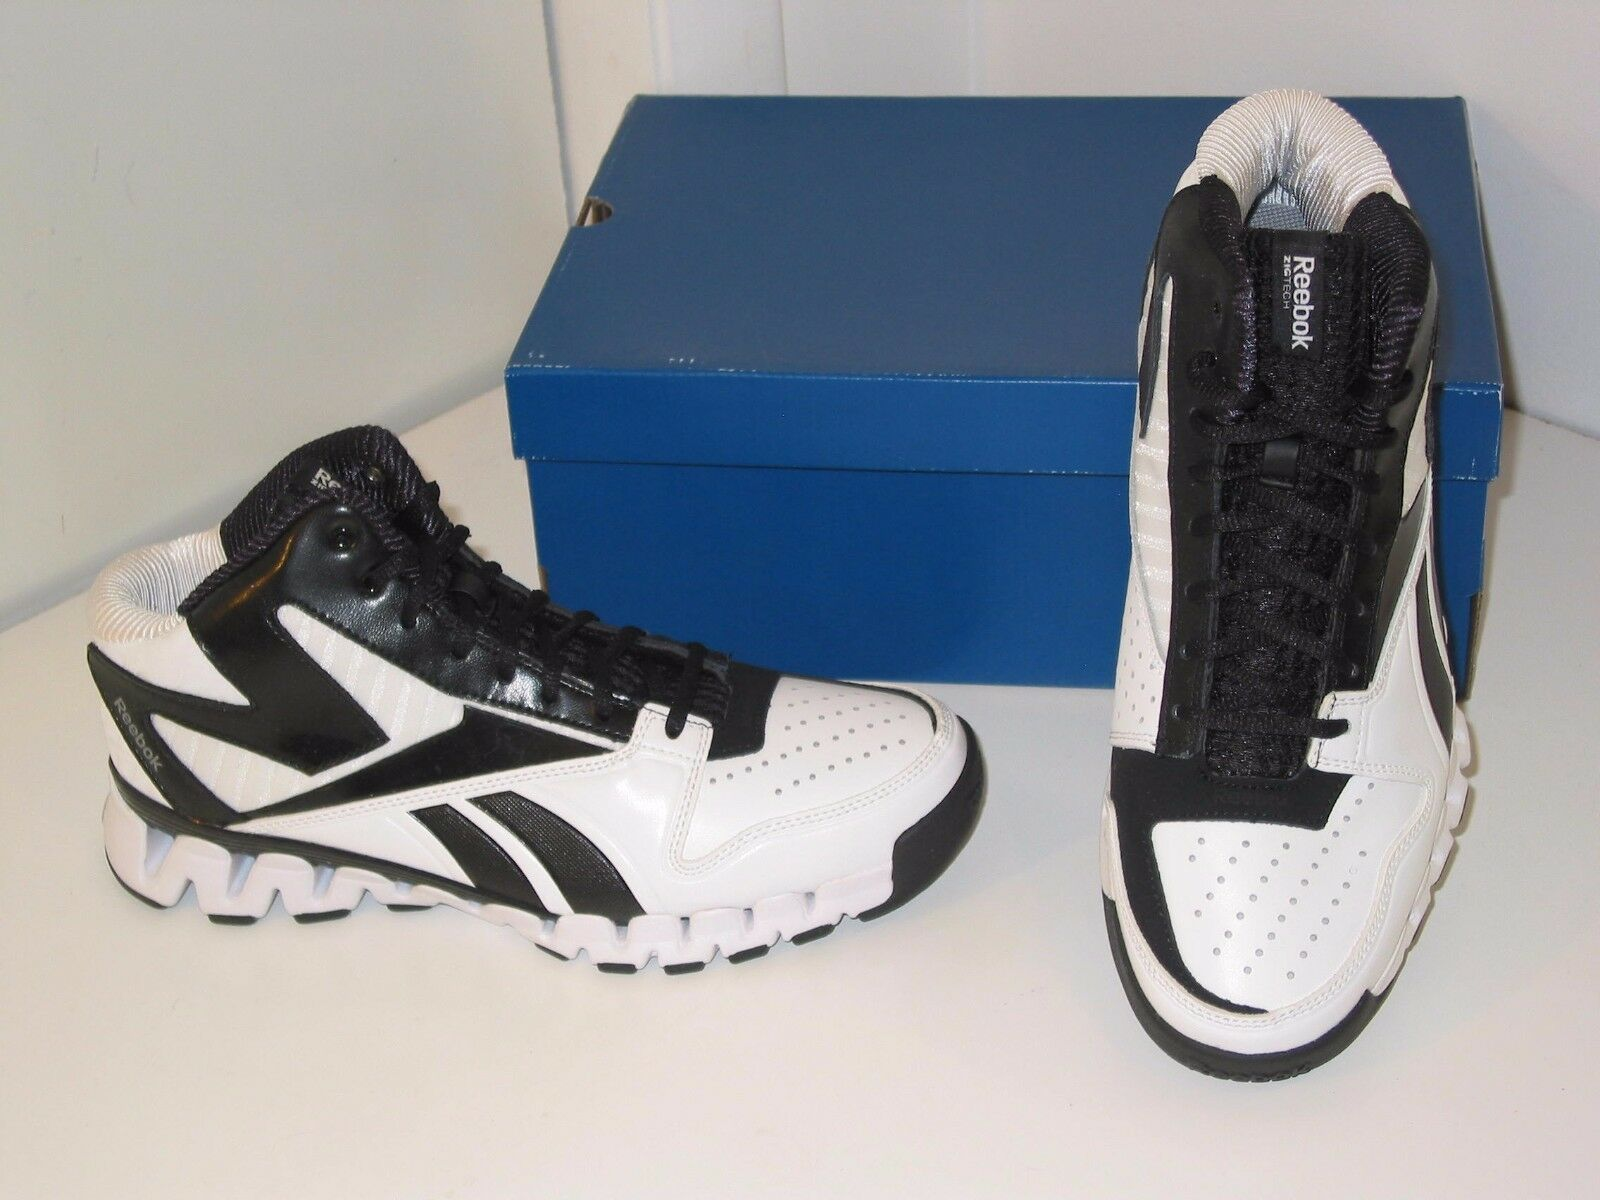 Reebok Zignano Profury Basketball Running White Black Sneakers Shoes Mens 8.5